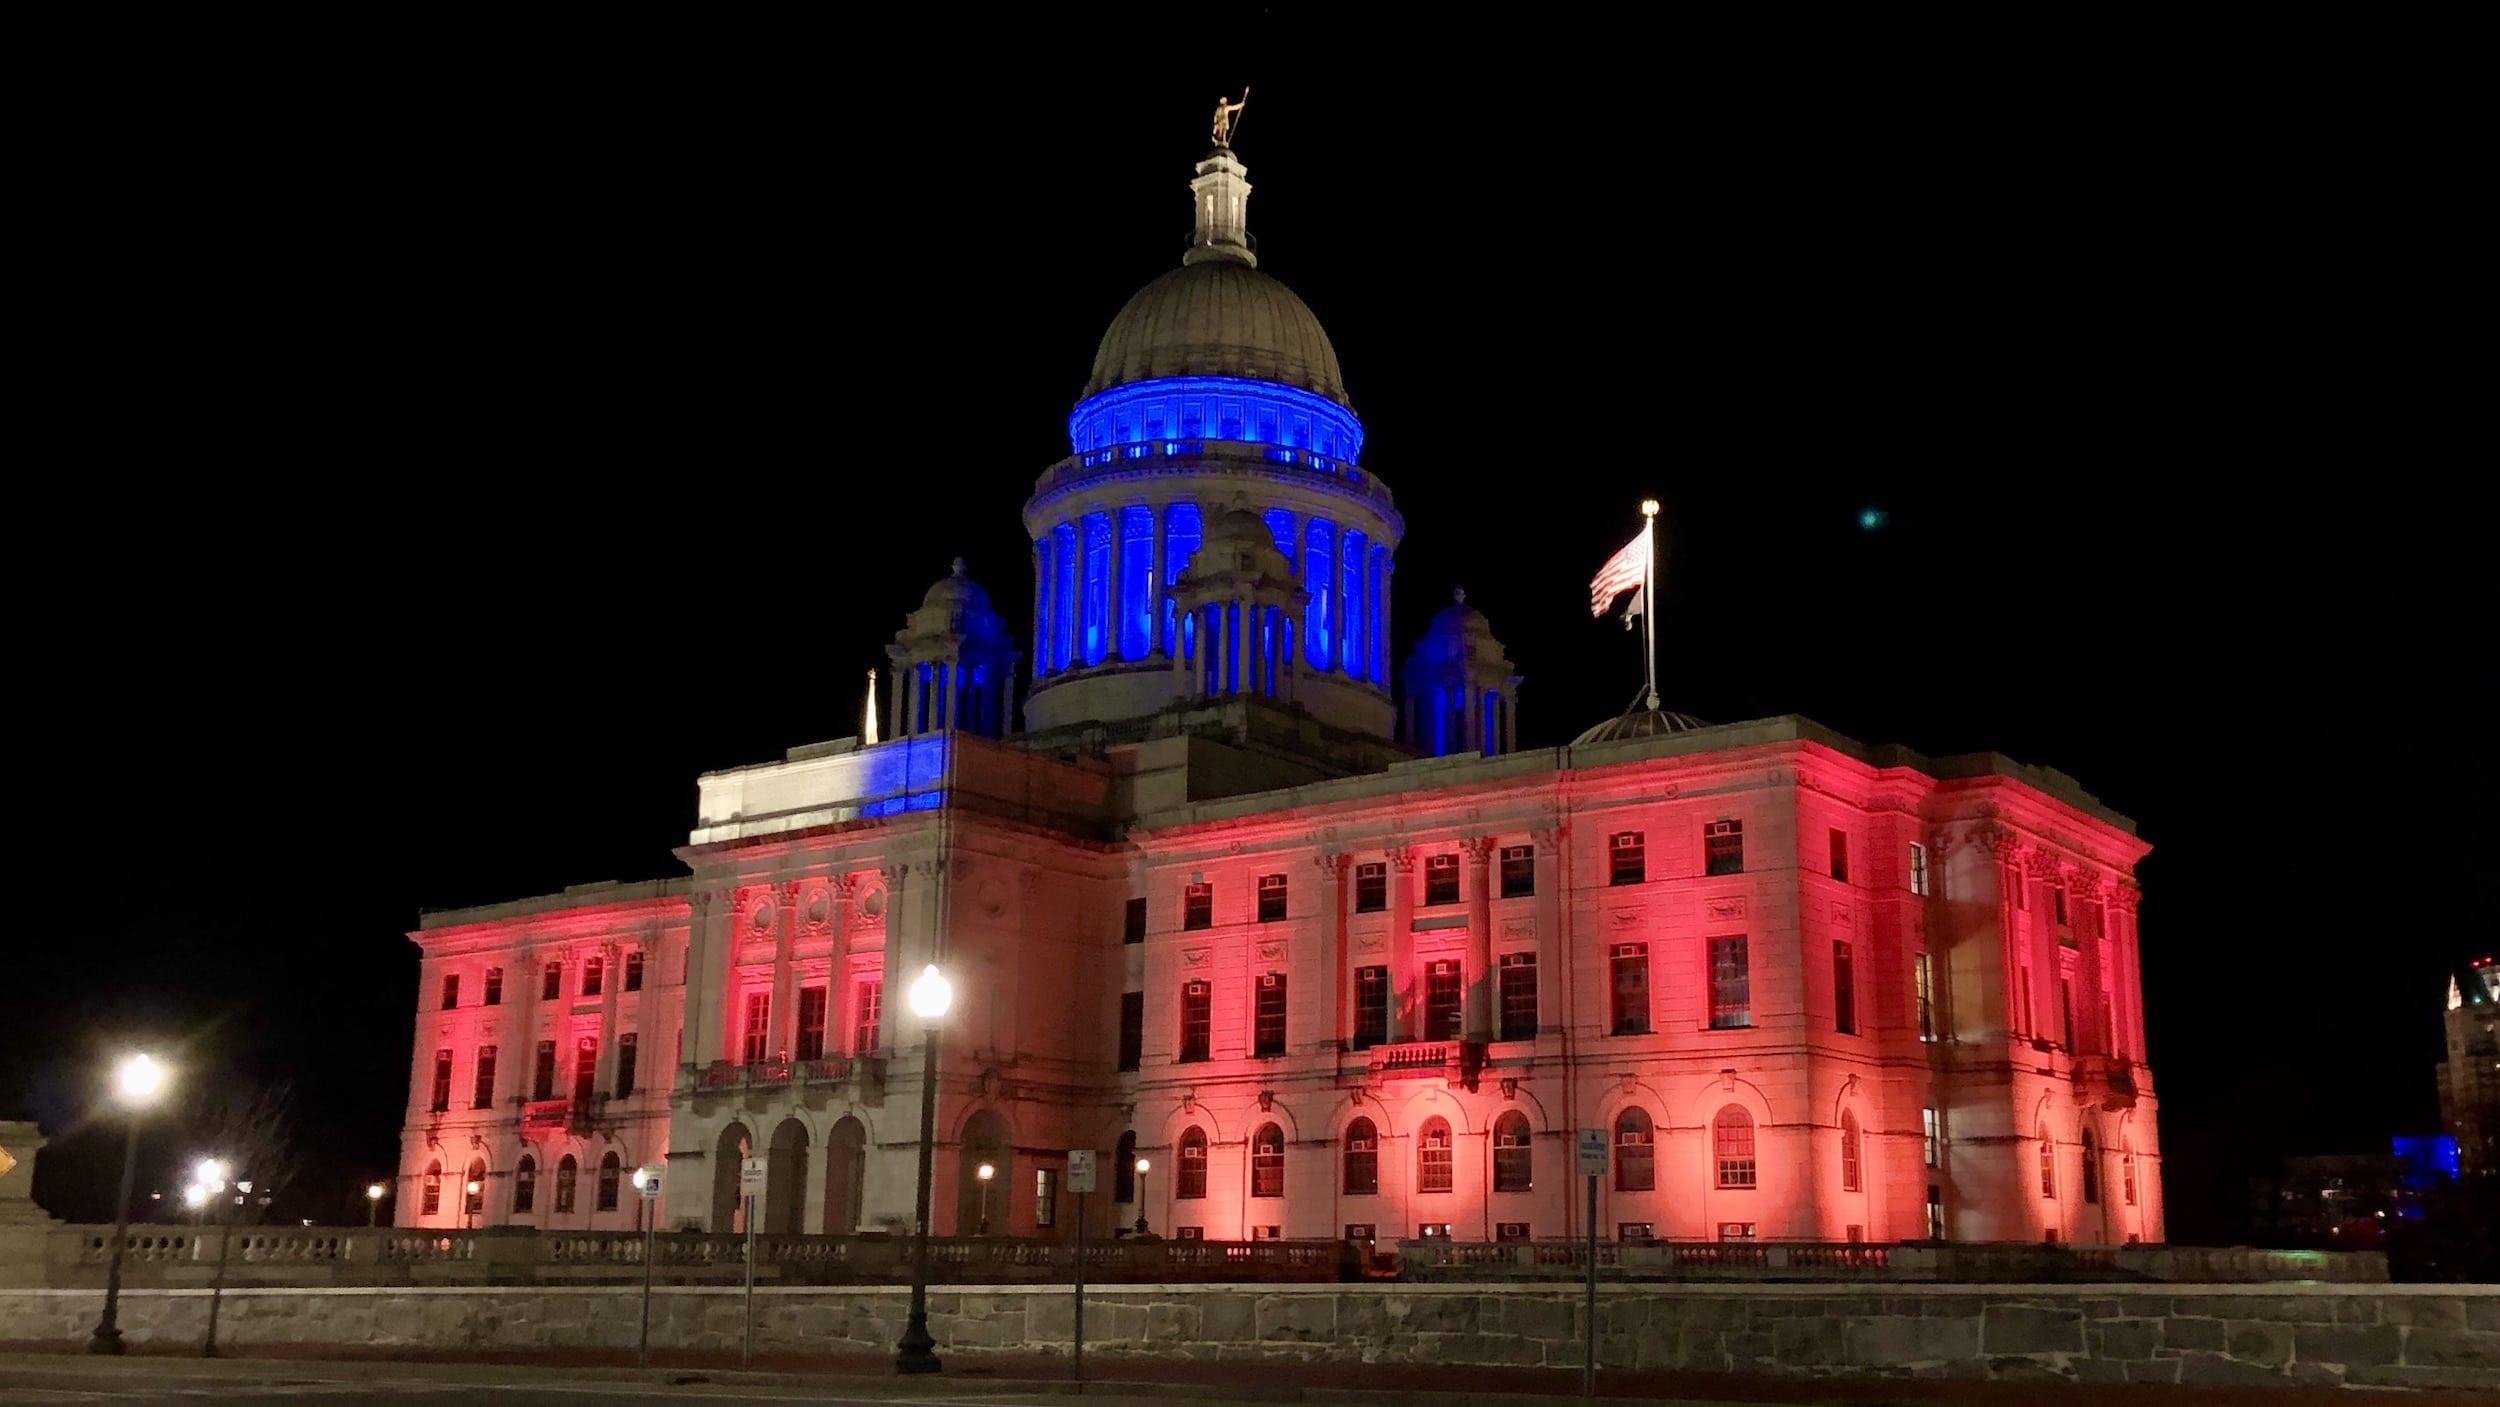 Photo for Rhode Island State House Monday, January 18, 2021 – Thursday, January 21, 2021